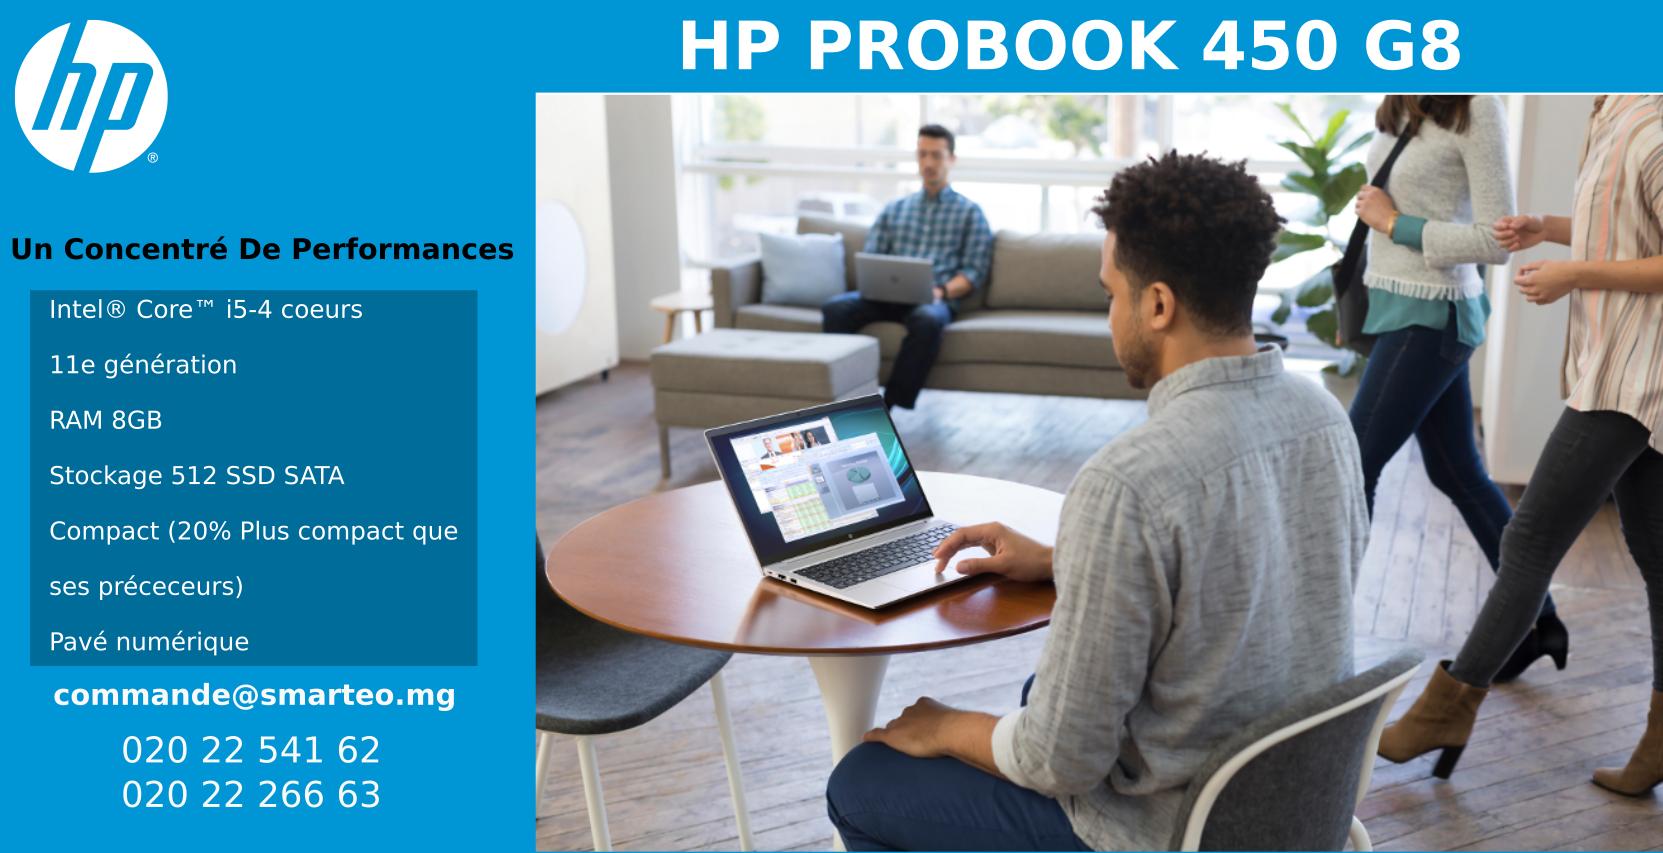 PC portable, laptop Core i5, RAM 8Gb, Disque SSD 512 Gb